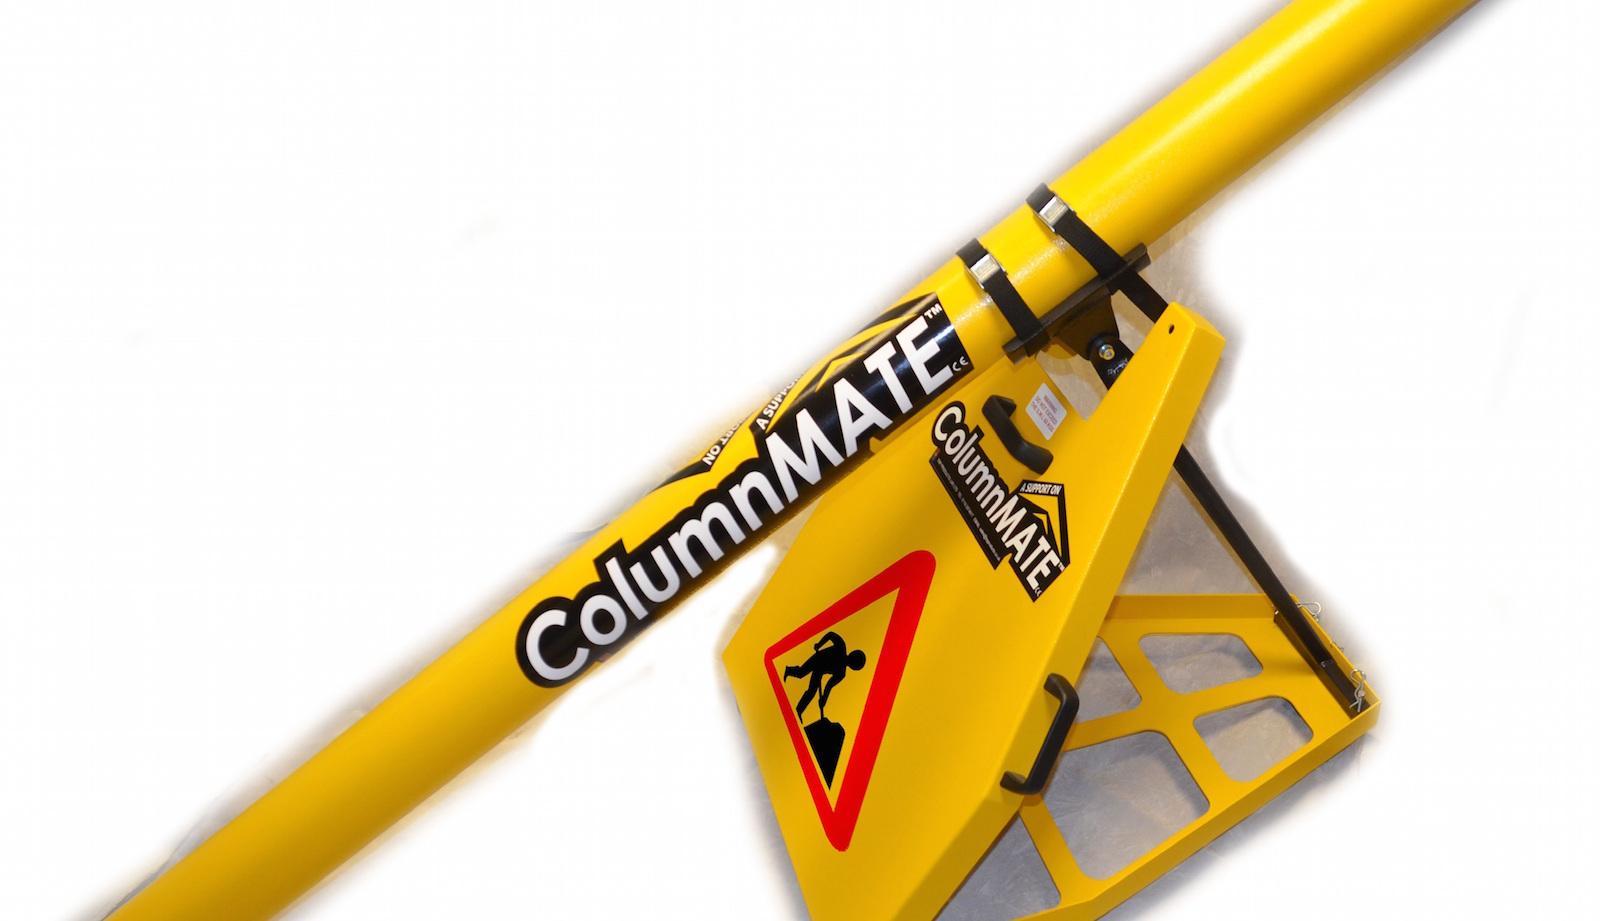 columnMATE